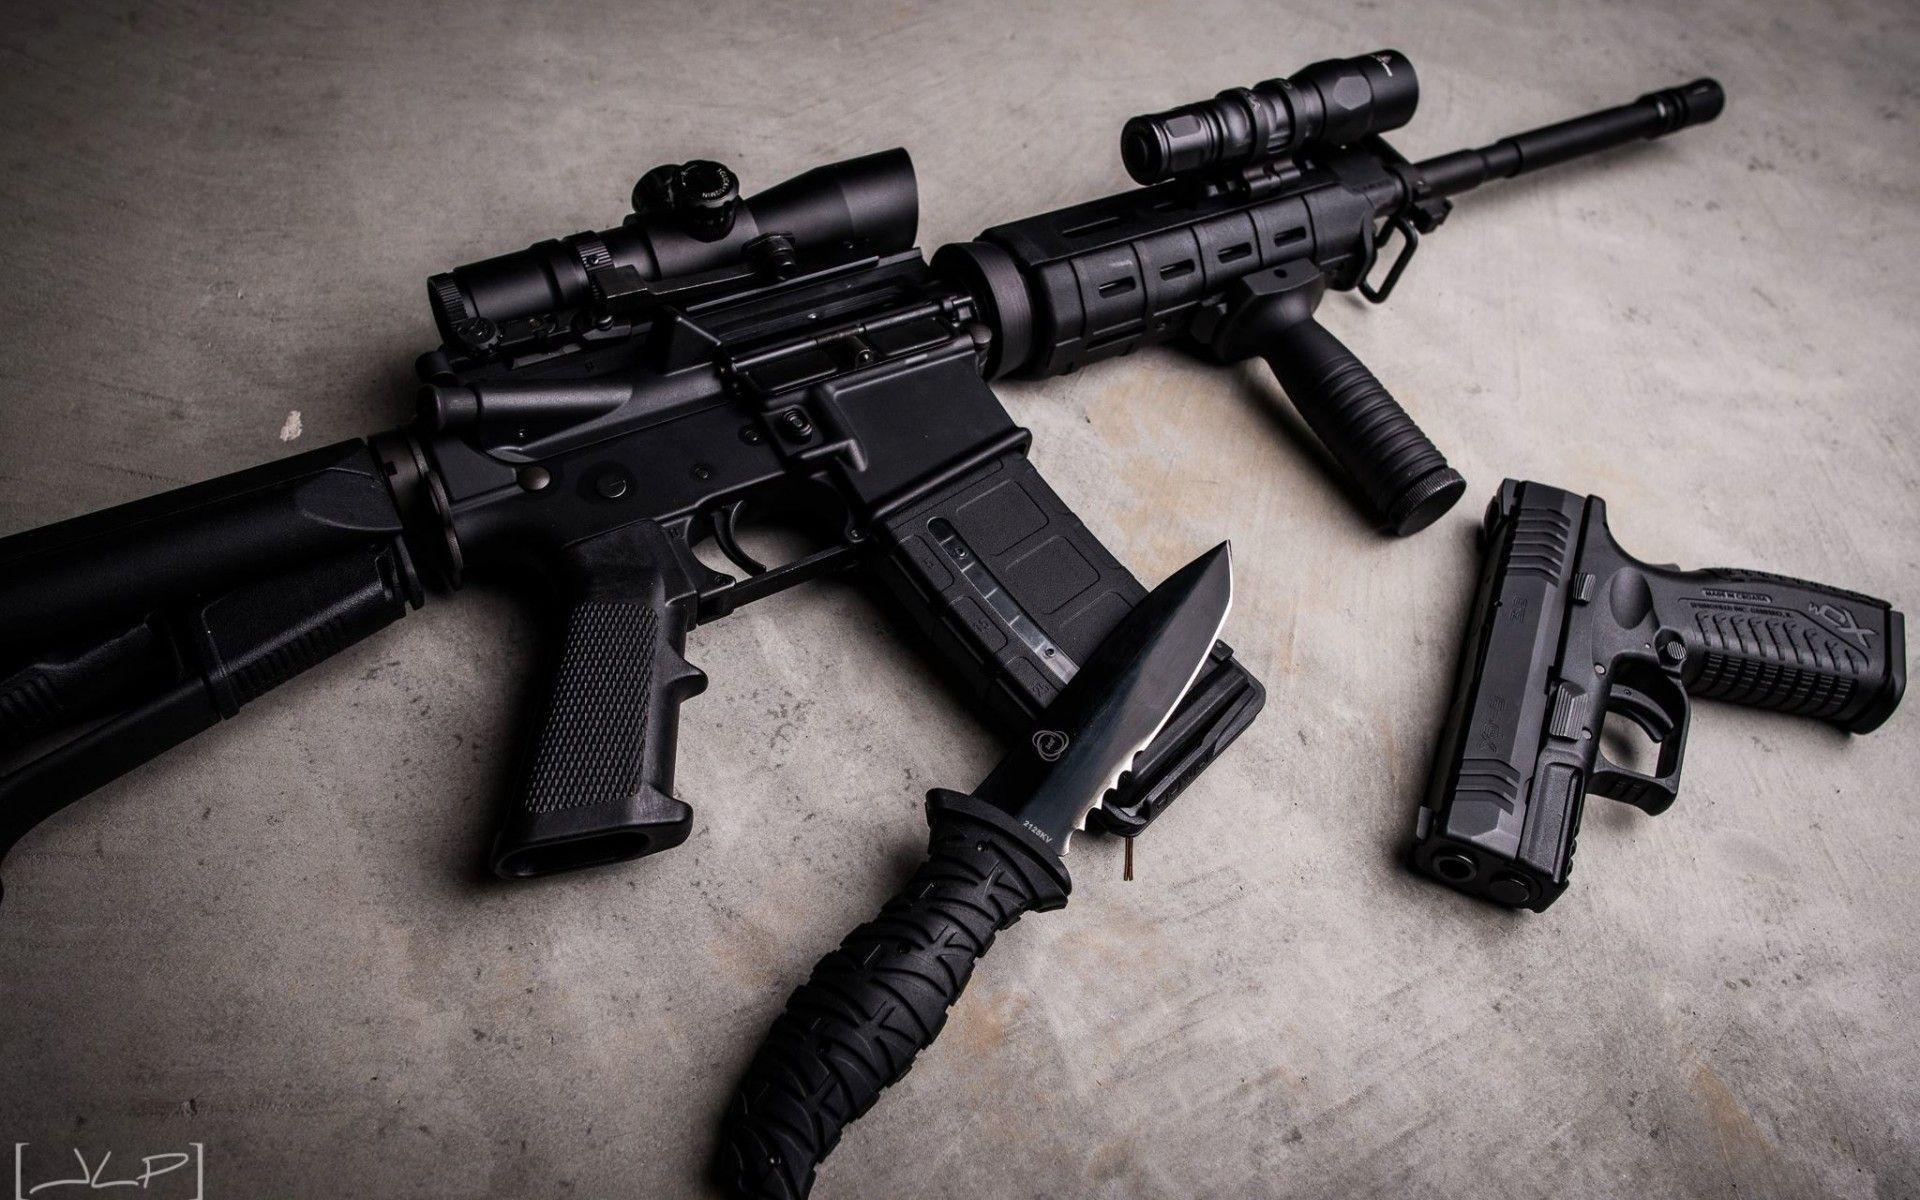 Rifles Guns Weapons Knives AR 15 Springfield Armory